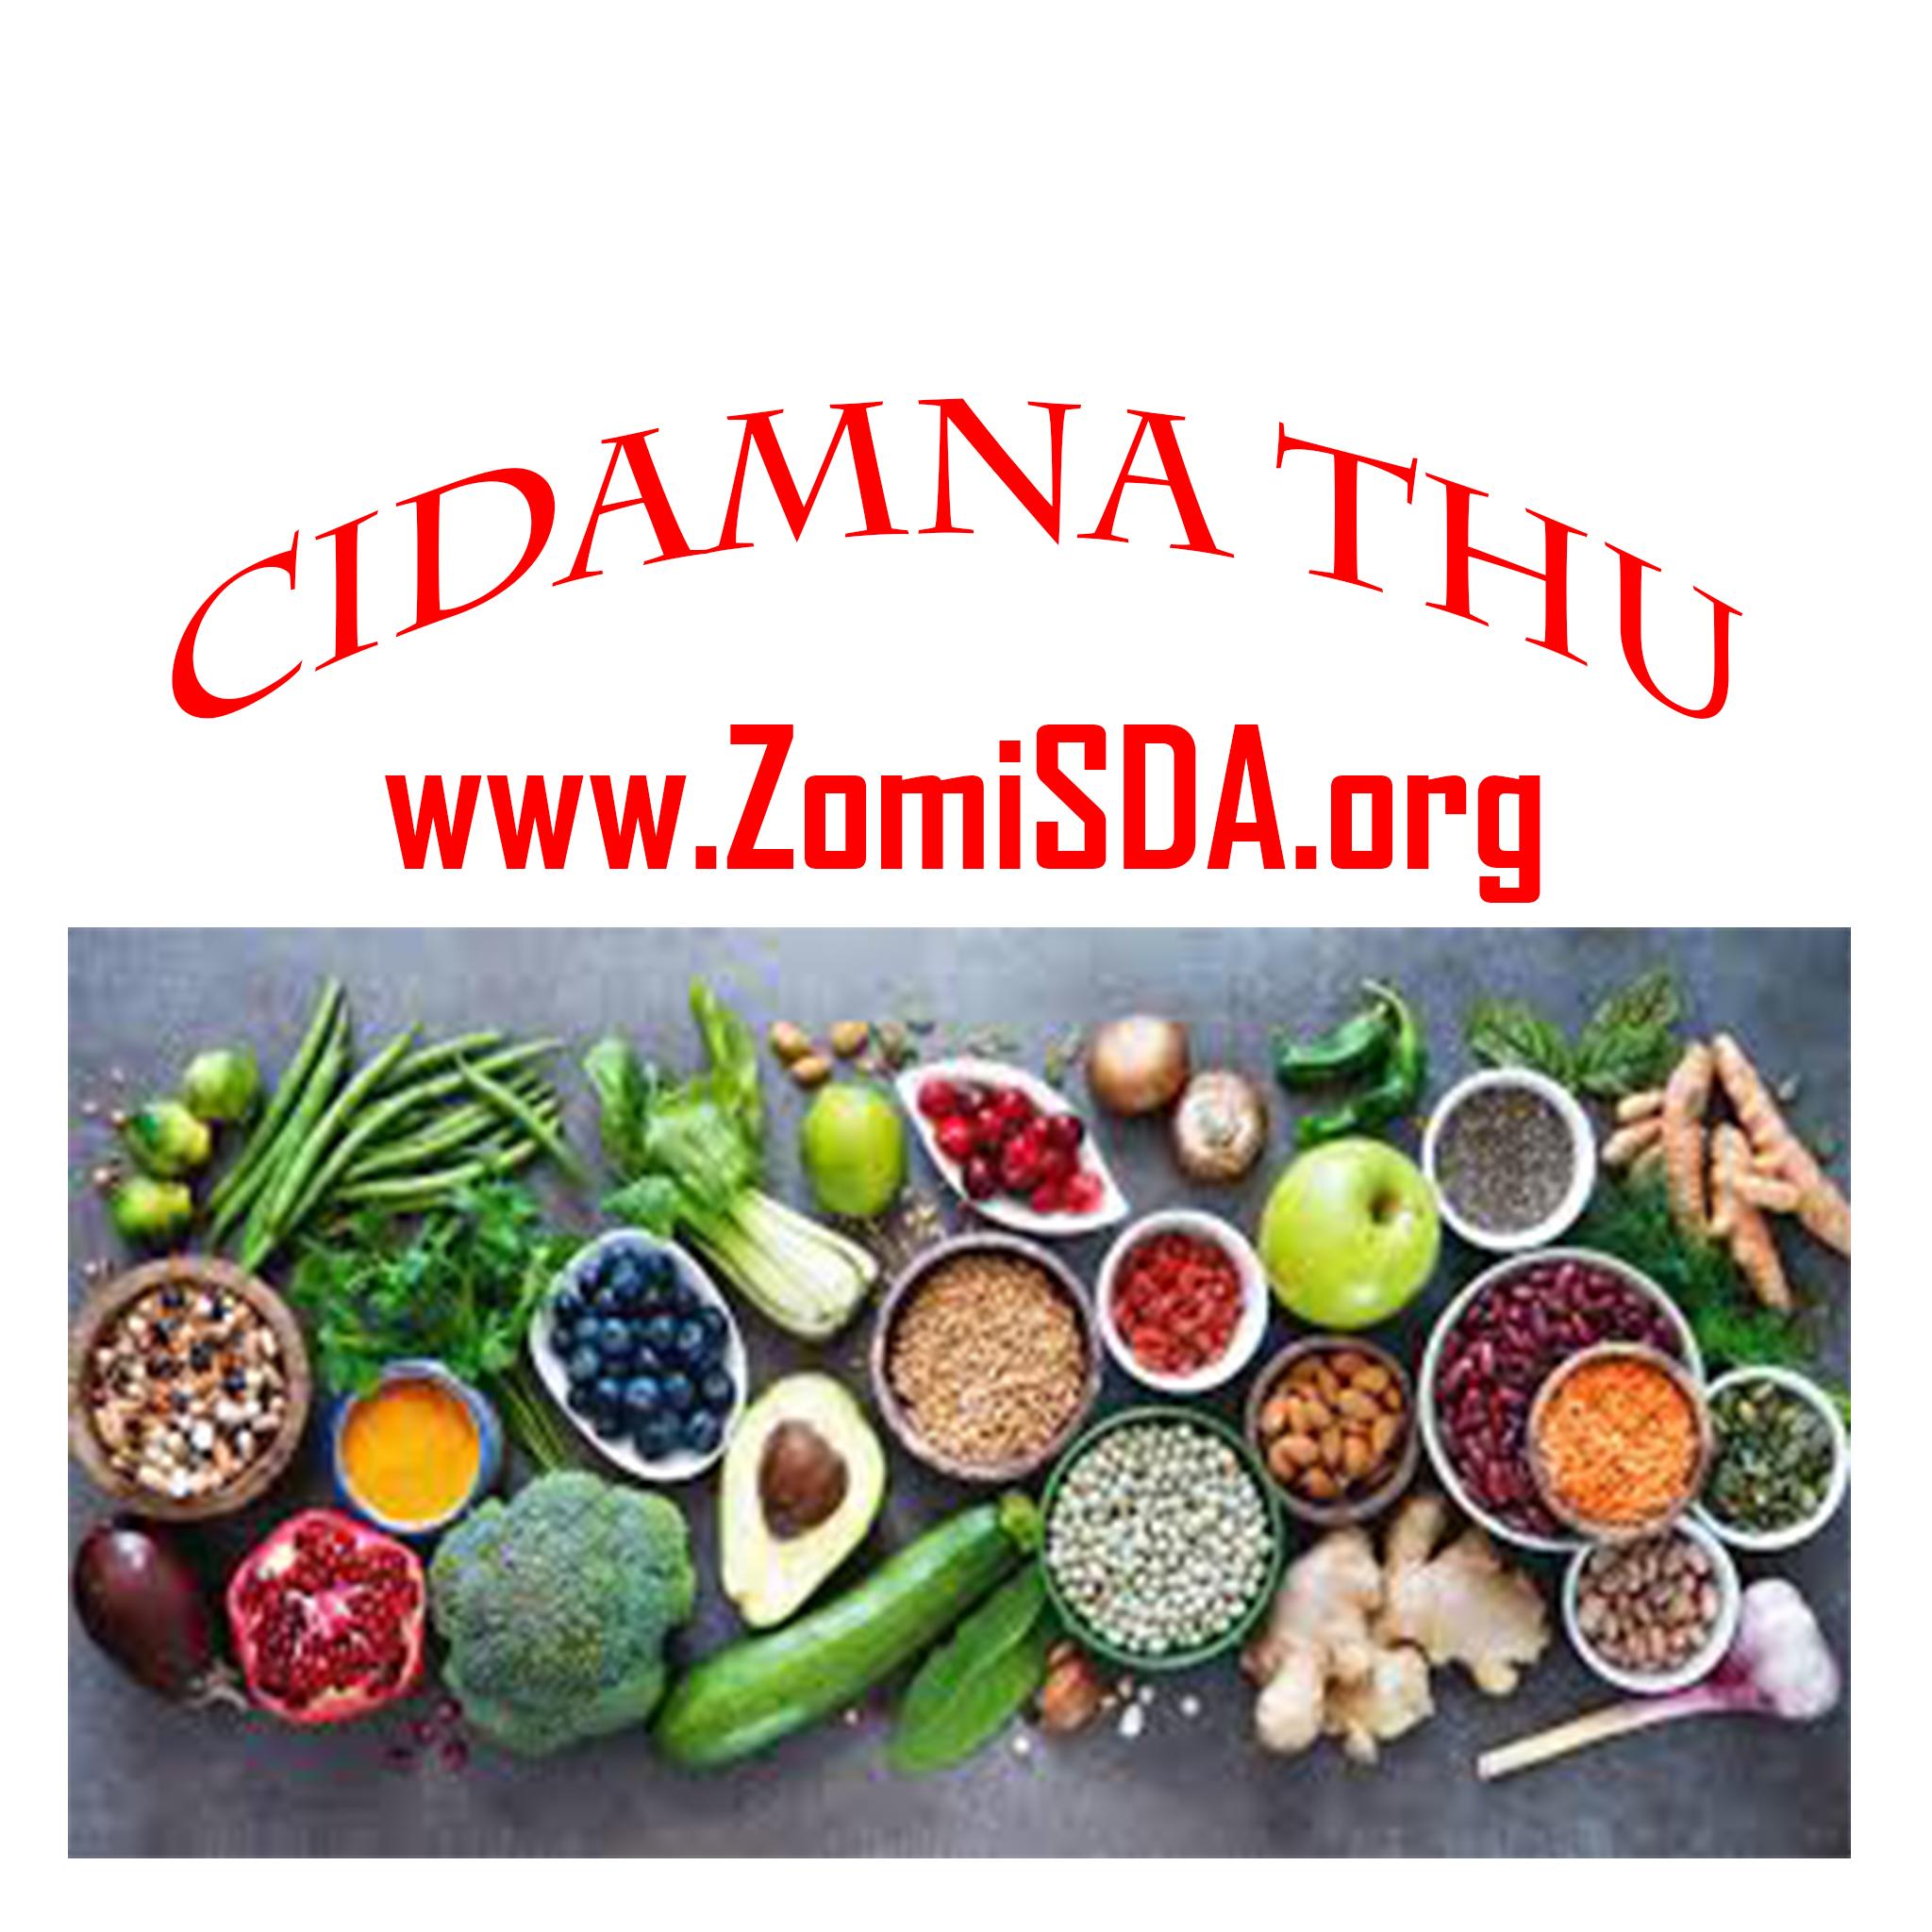 ZomiSDA.org, Zomi ADventist, Cidamna, Health post, Zolai, Zokam, Zopau, Tedim